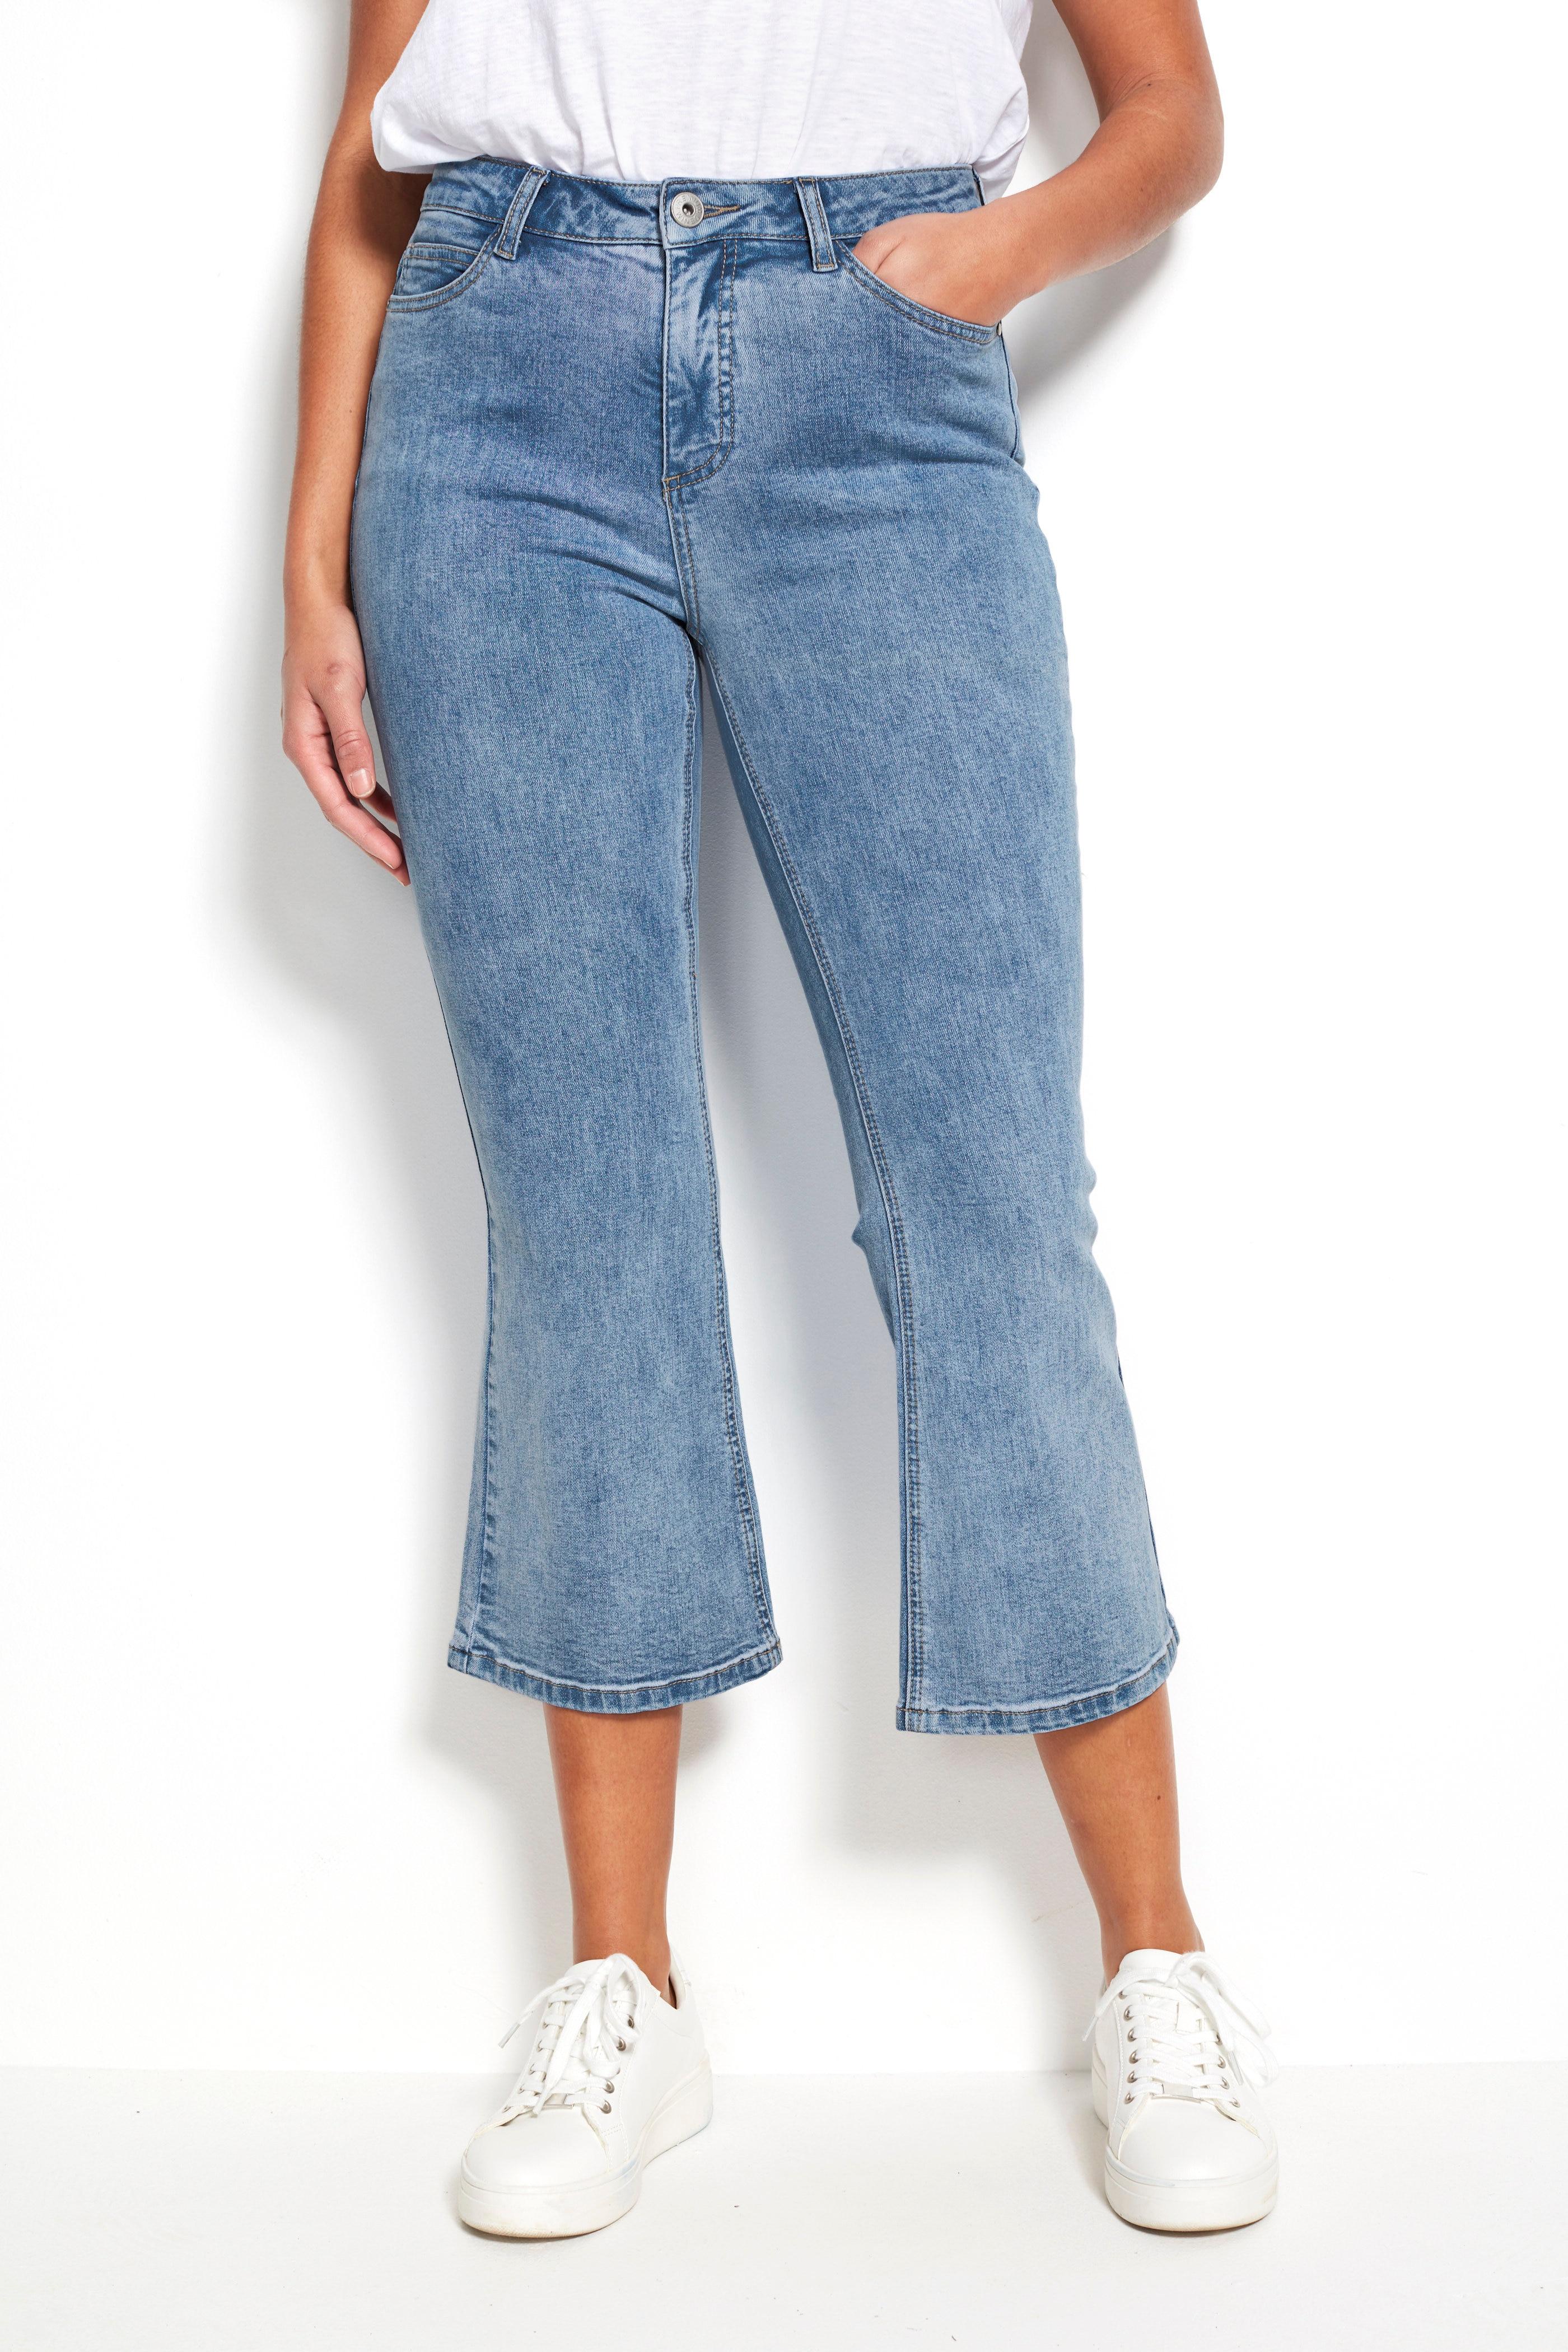 Korte, utsvingte jeans